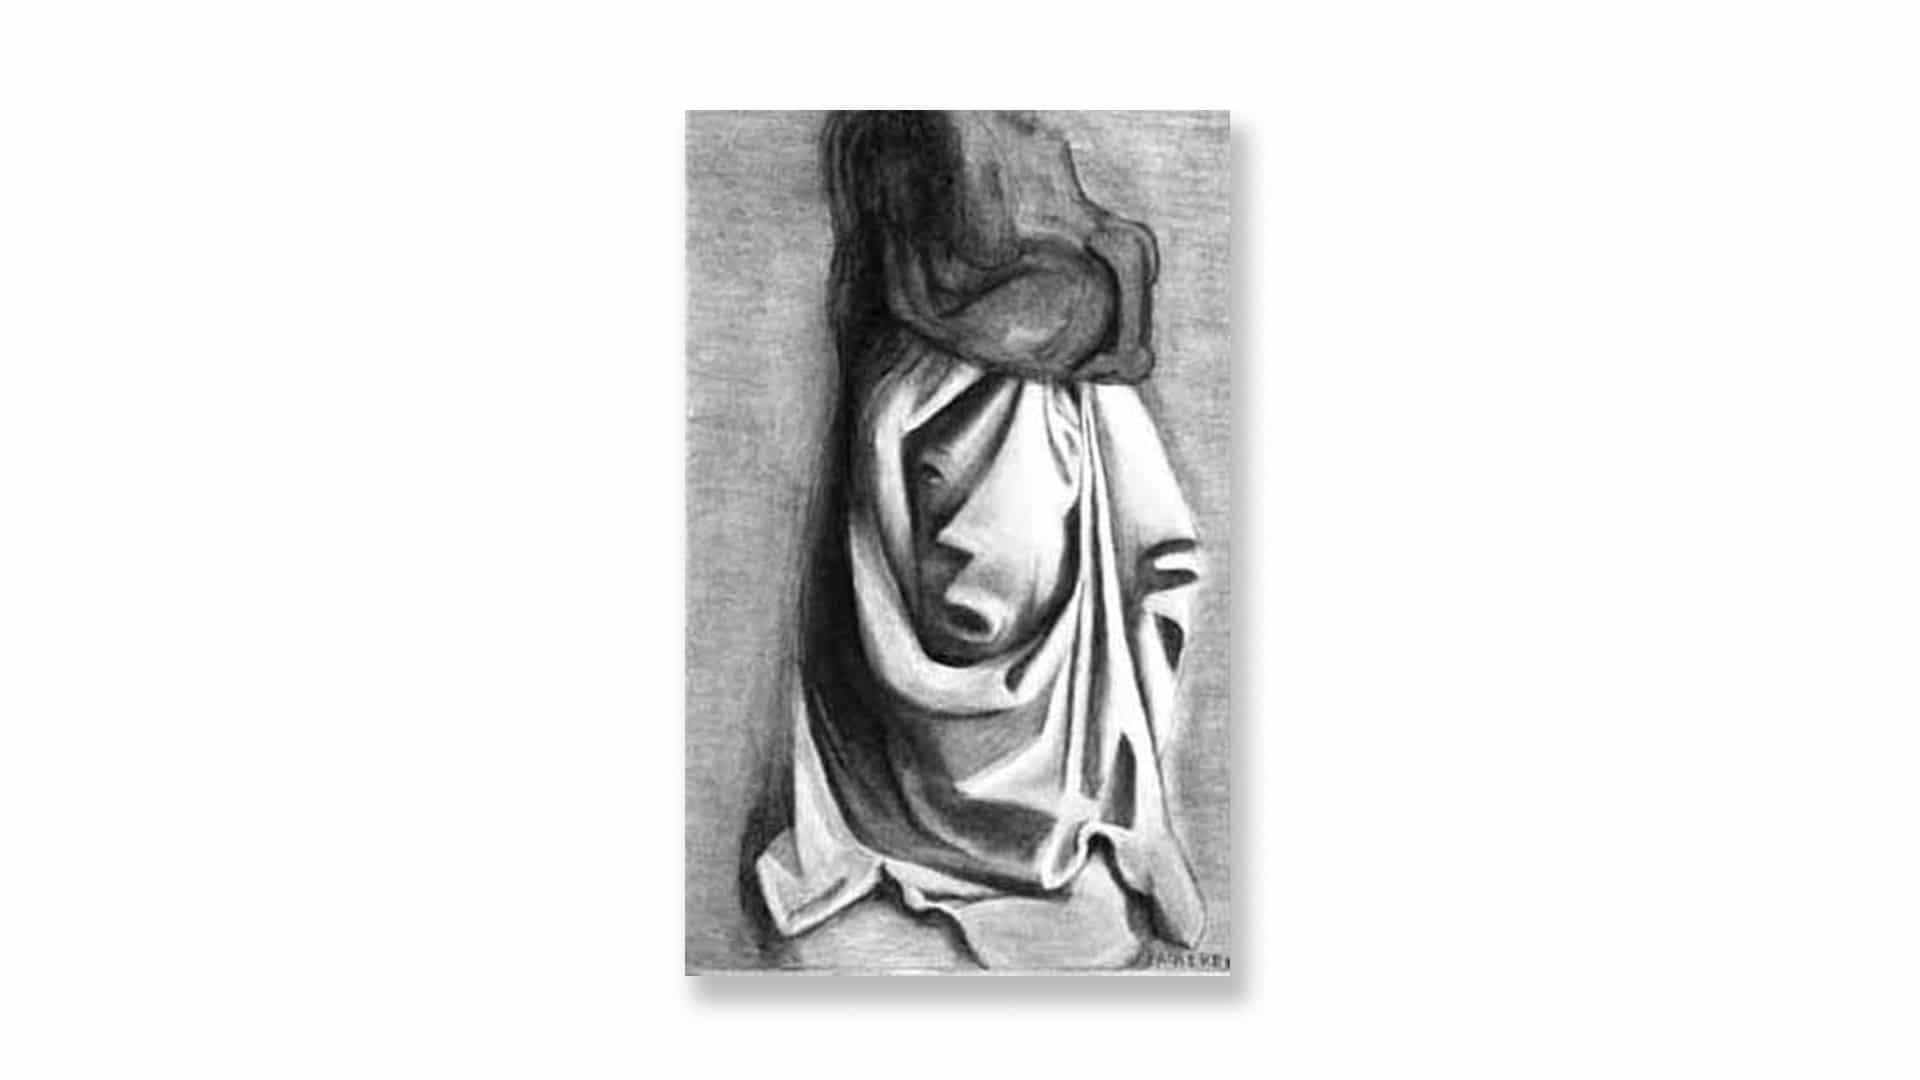 dibujos-galeria-atxeden-pachere-Dibujo-02